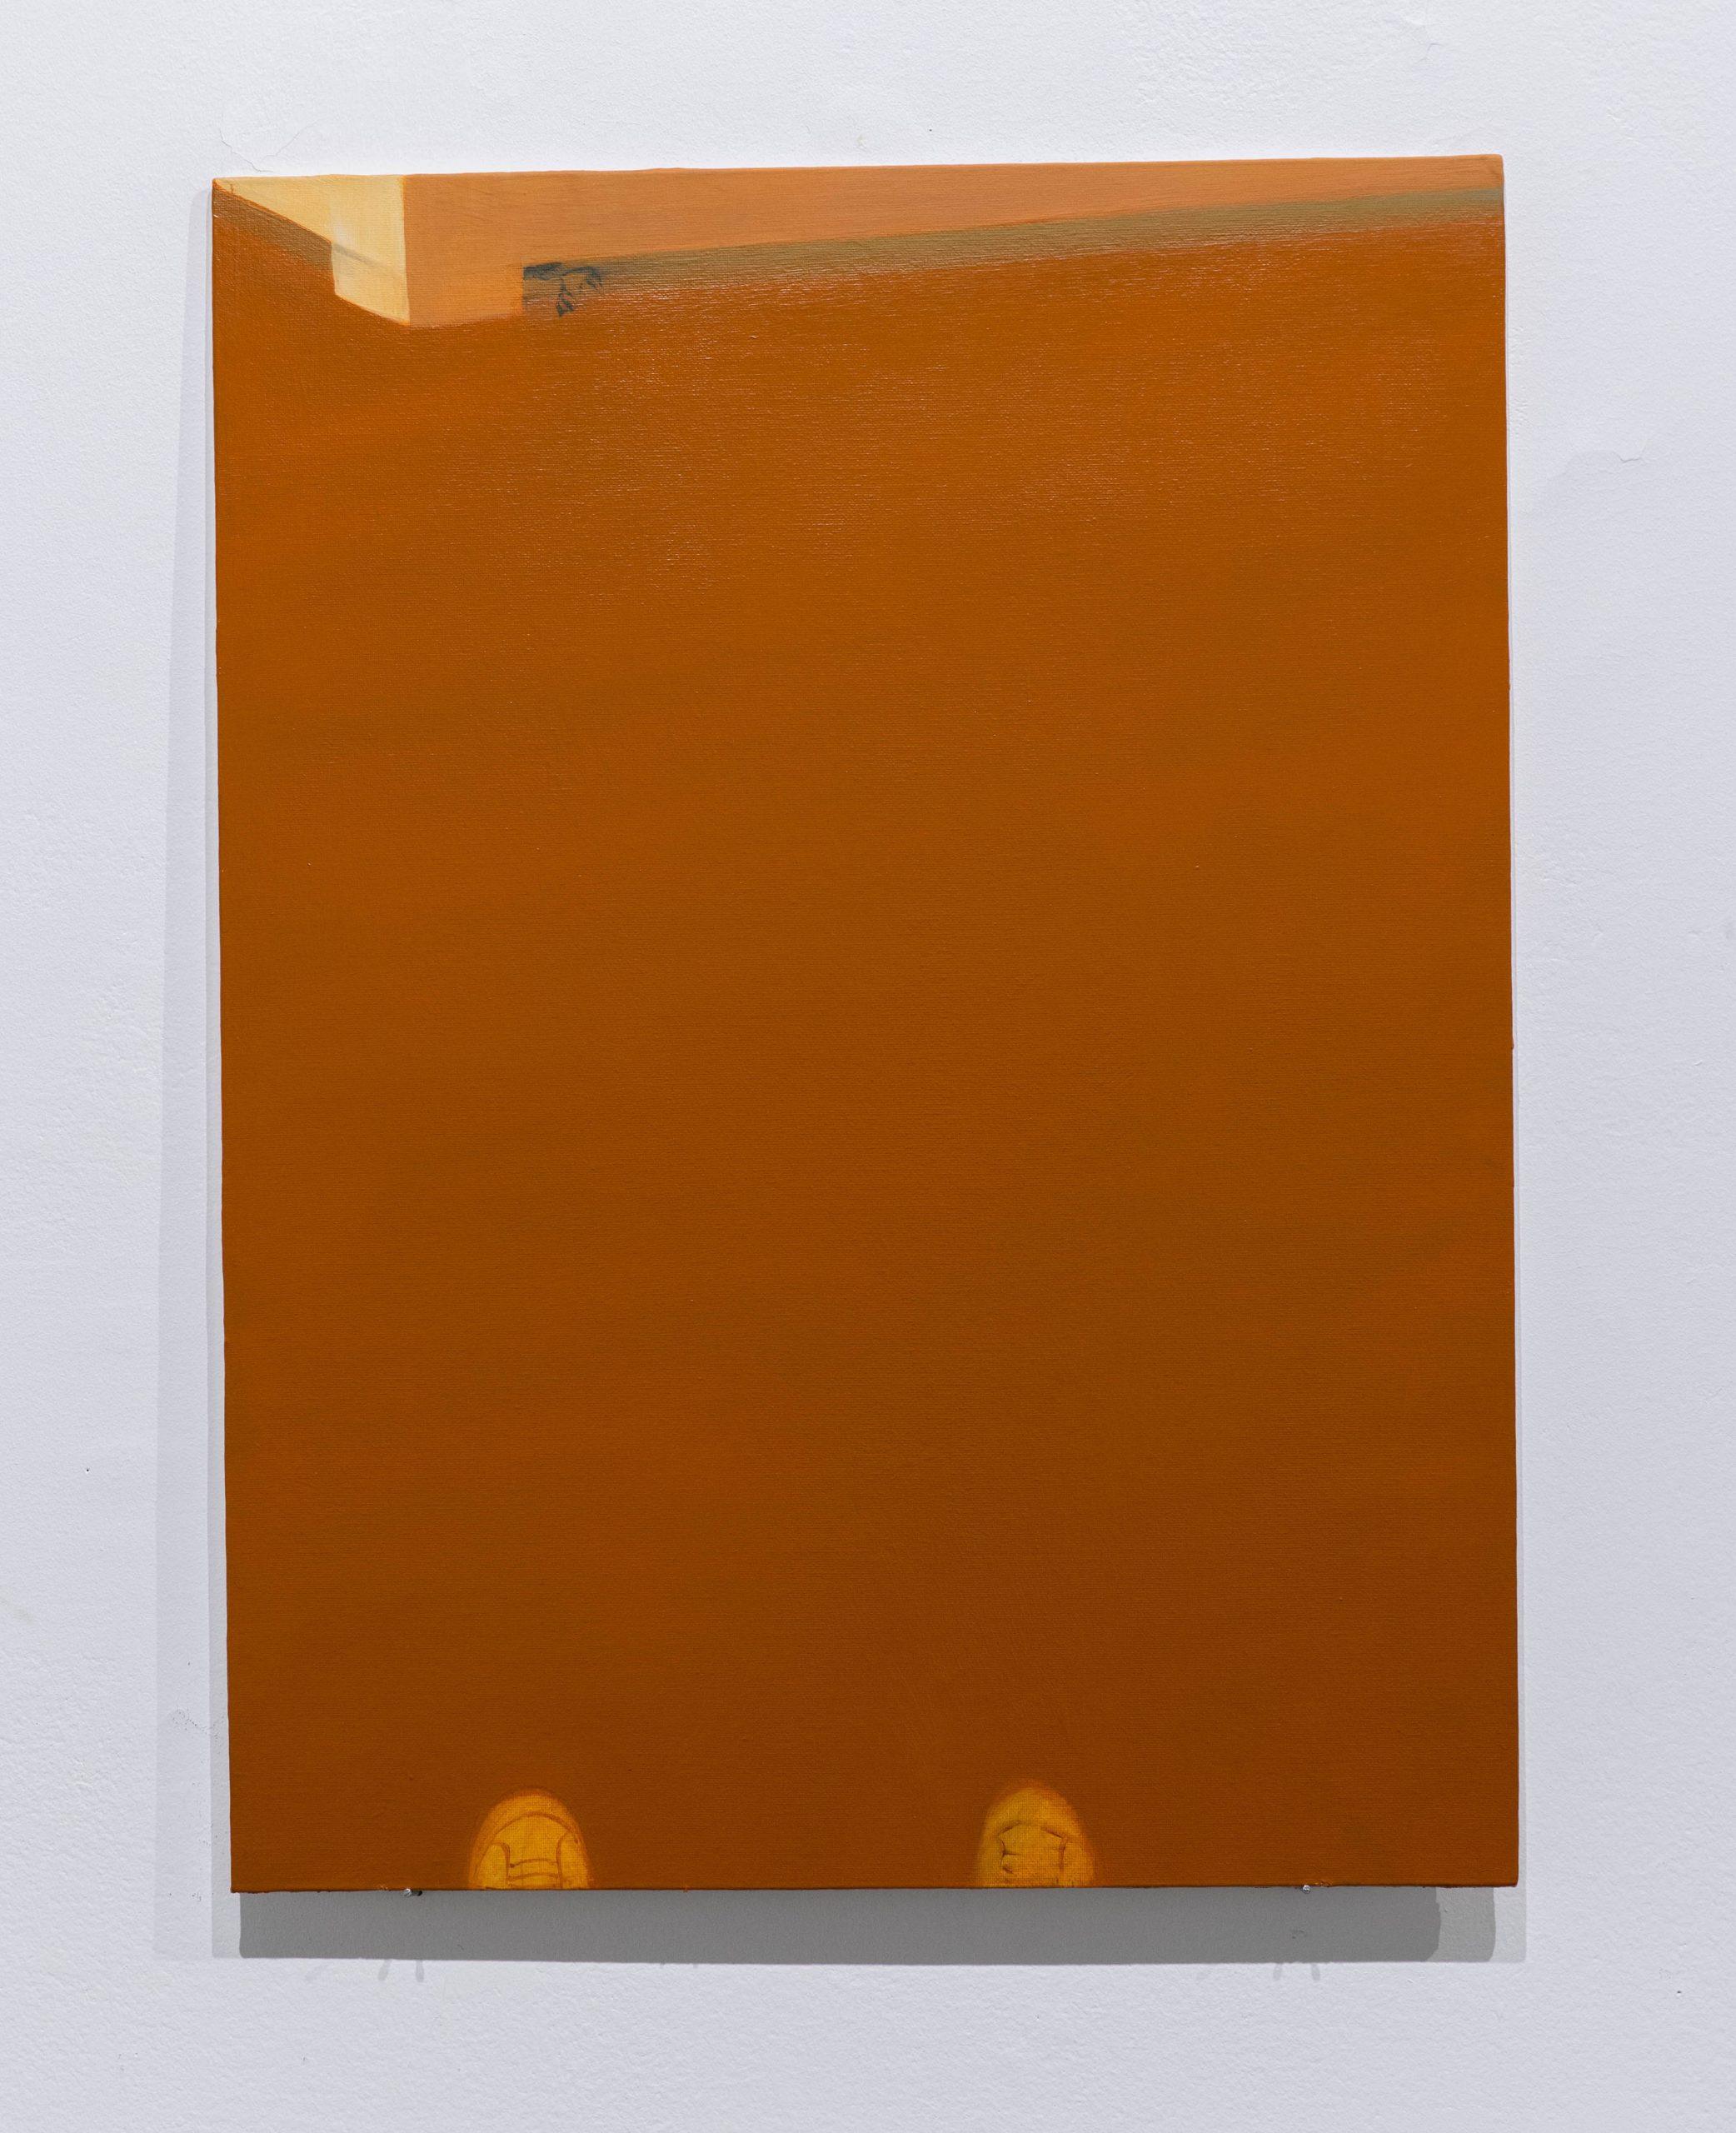 Three Legs, 2020, Acrylic On Canvas, 24 x 18 in